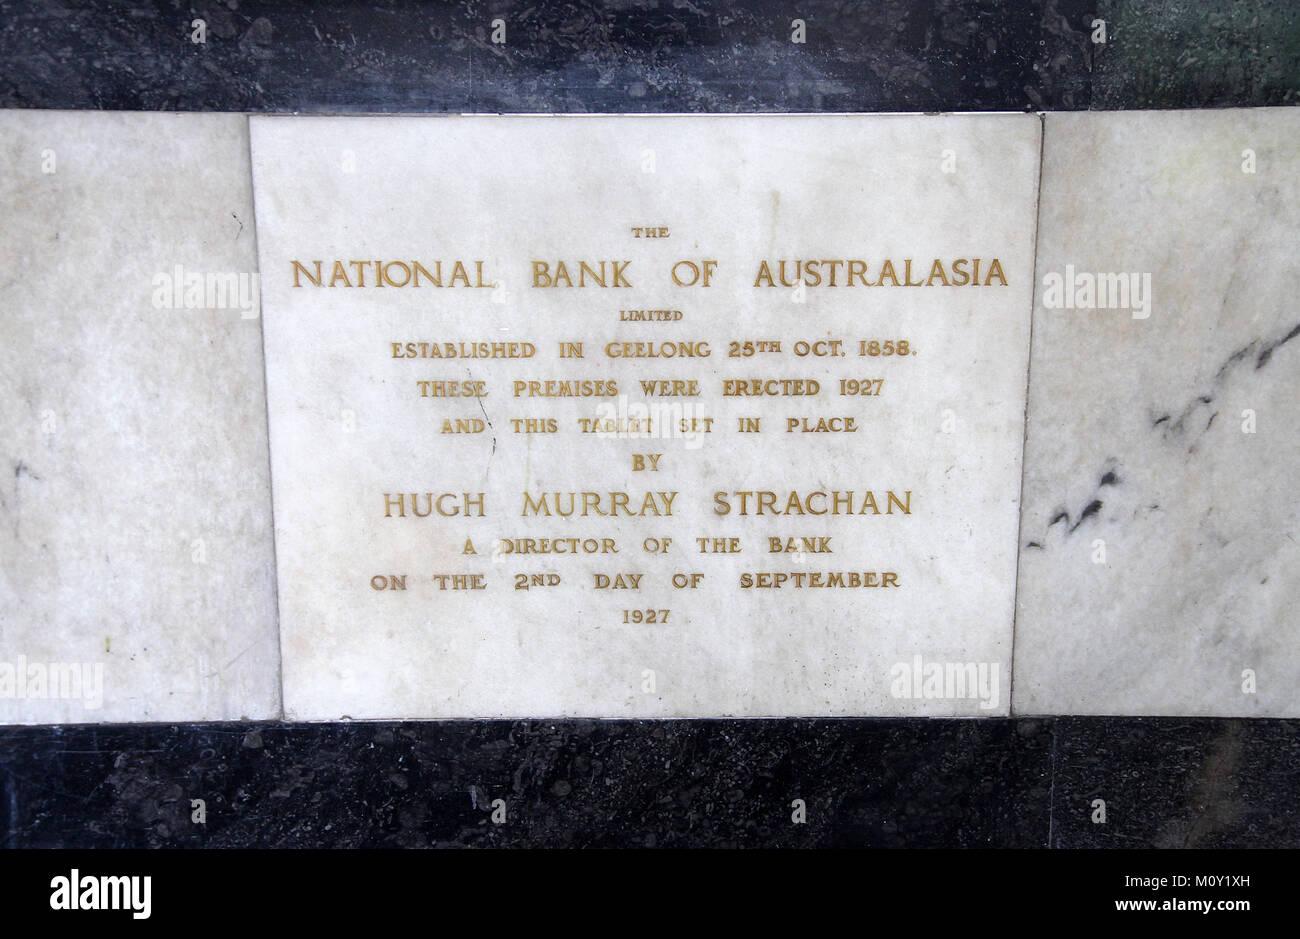 National Bank of Australasia Plaque commémorative Photo Stock